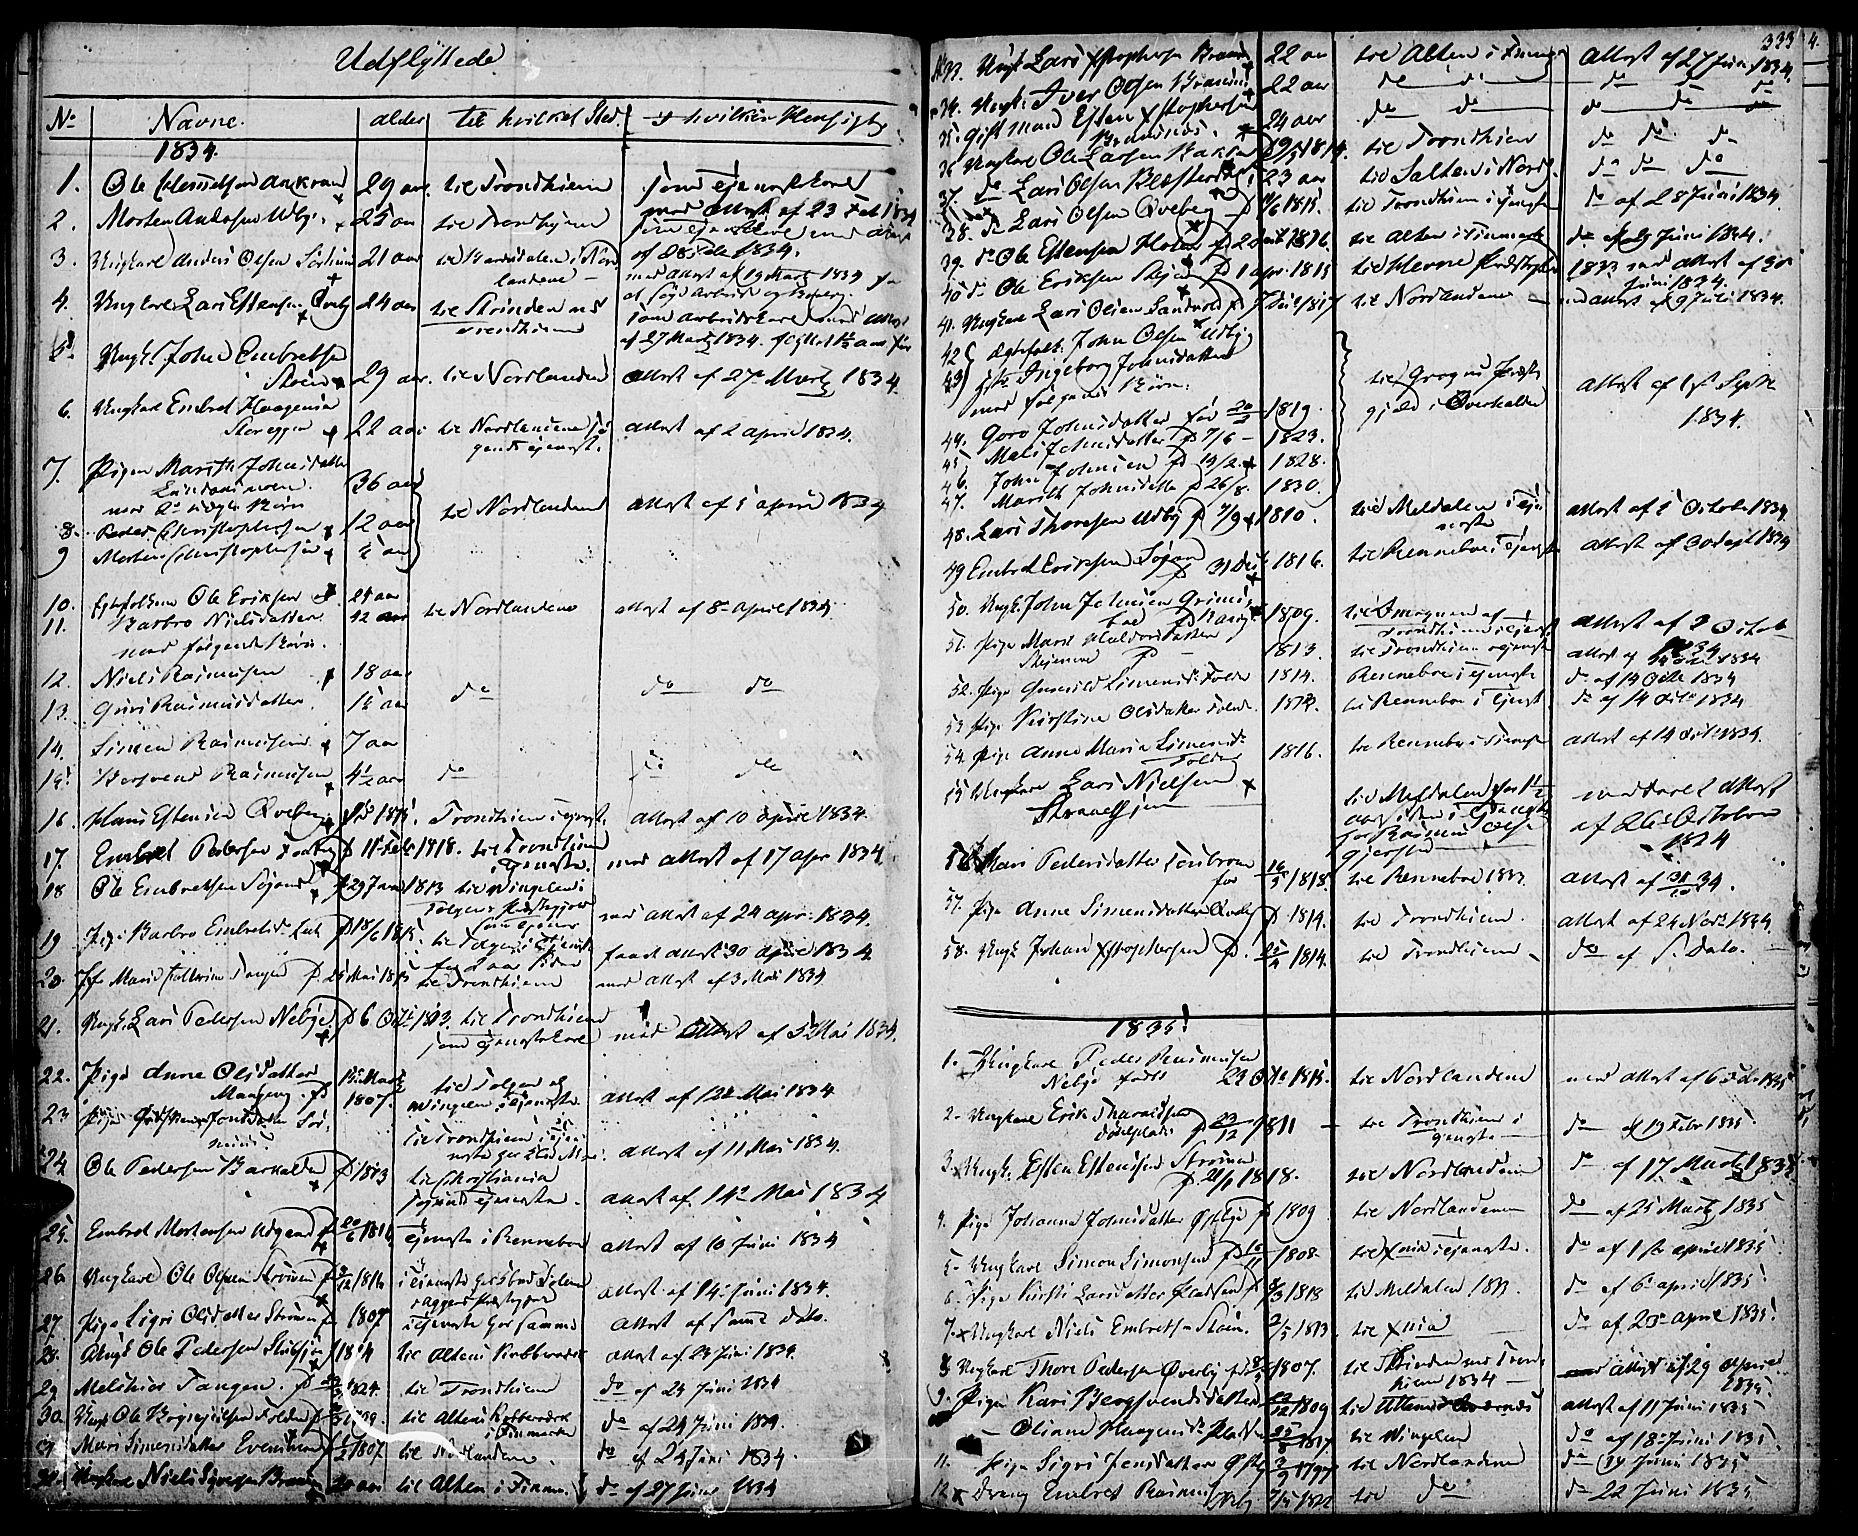 SAH, Tynset prestekontor, Ministerialbok nr. 19, 1829-1847, s. 333